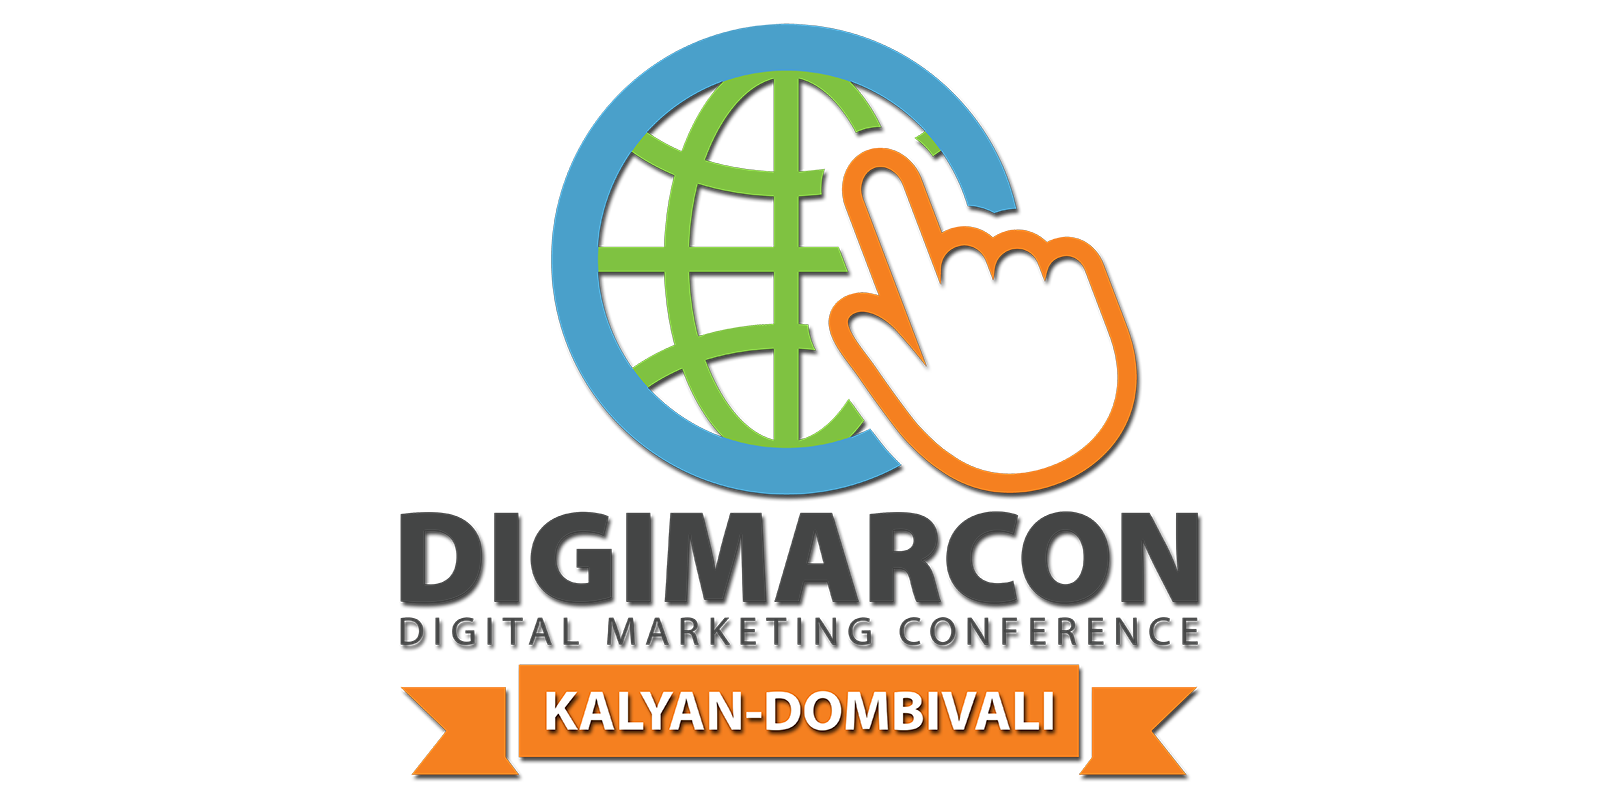 Kalyan-Dombivali Digital Marketing Conference